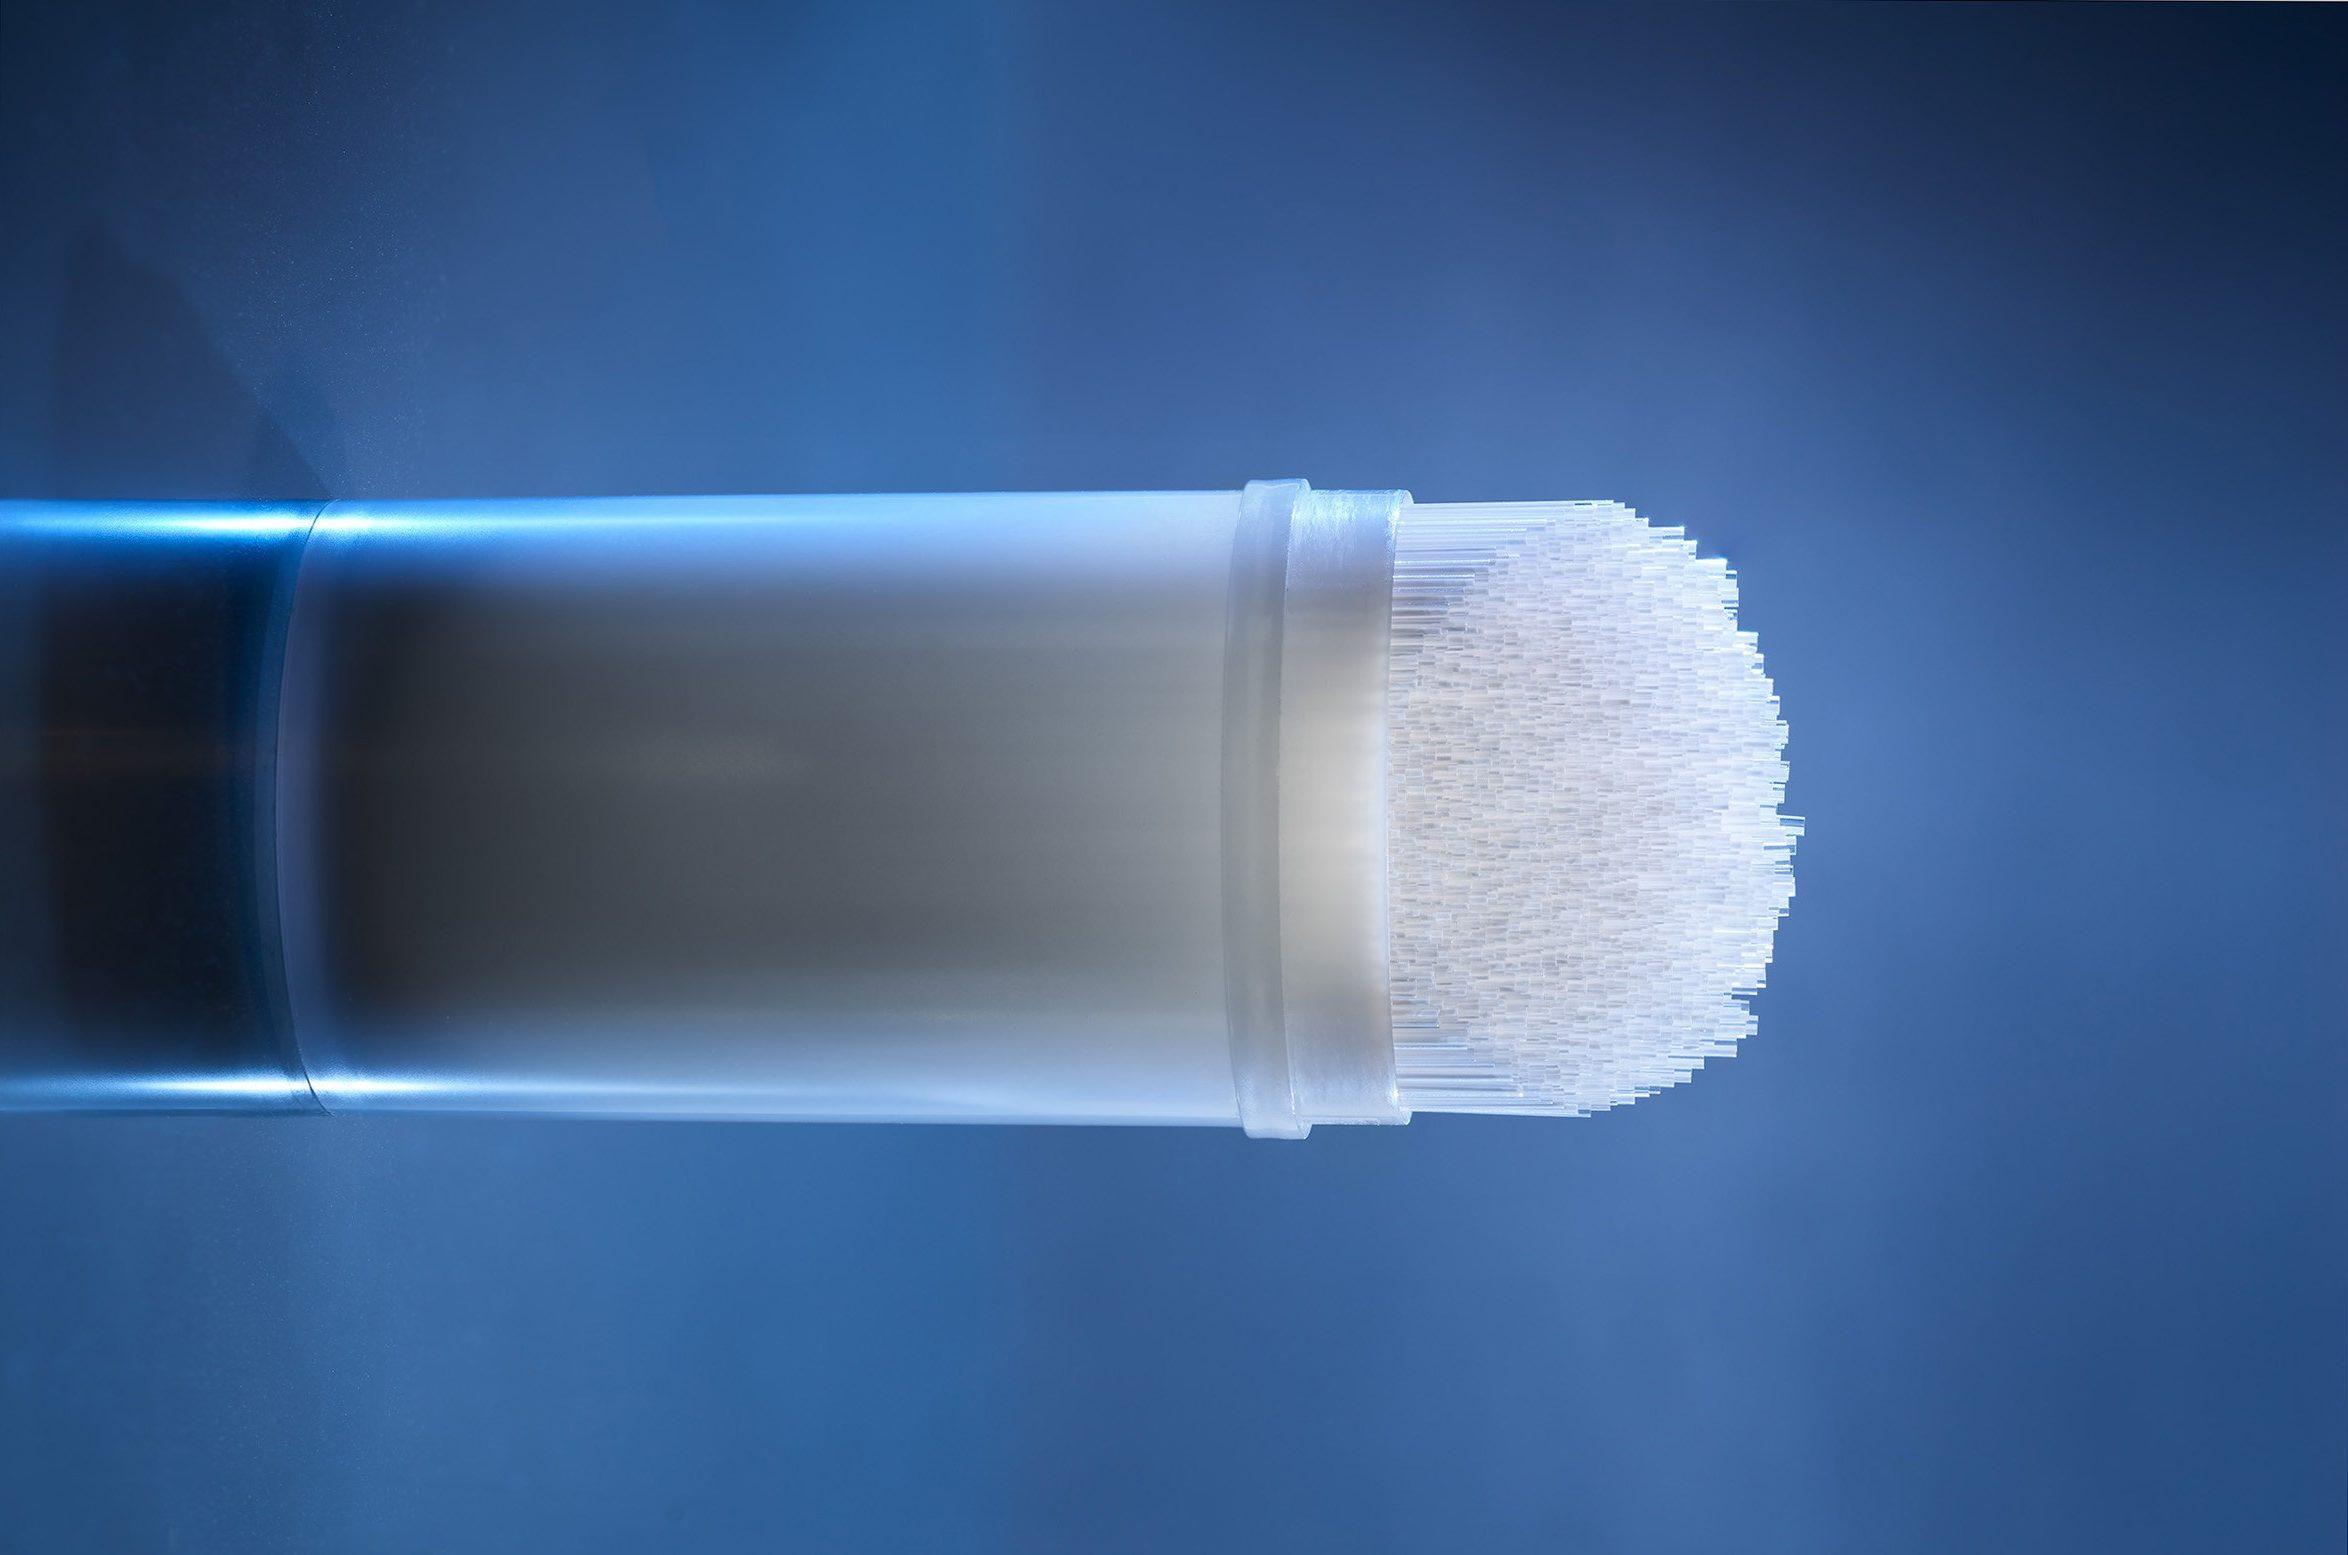 Optinova_Group_Optinfusion_IV_Catheter_Tubing